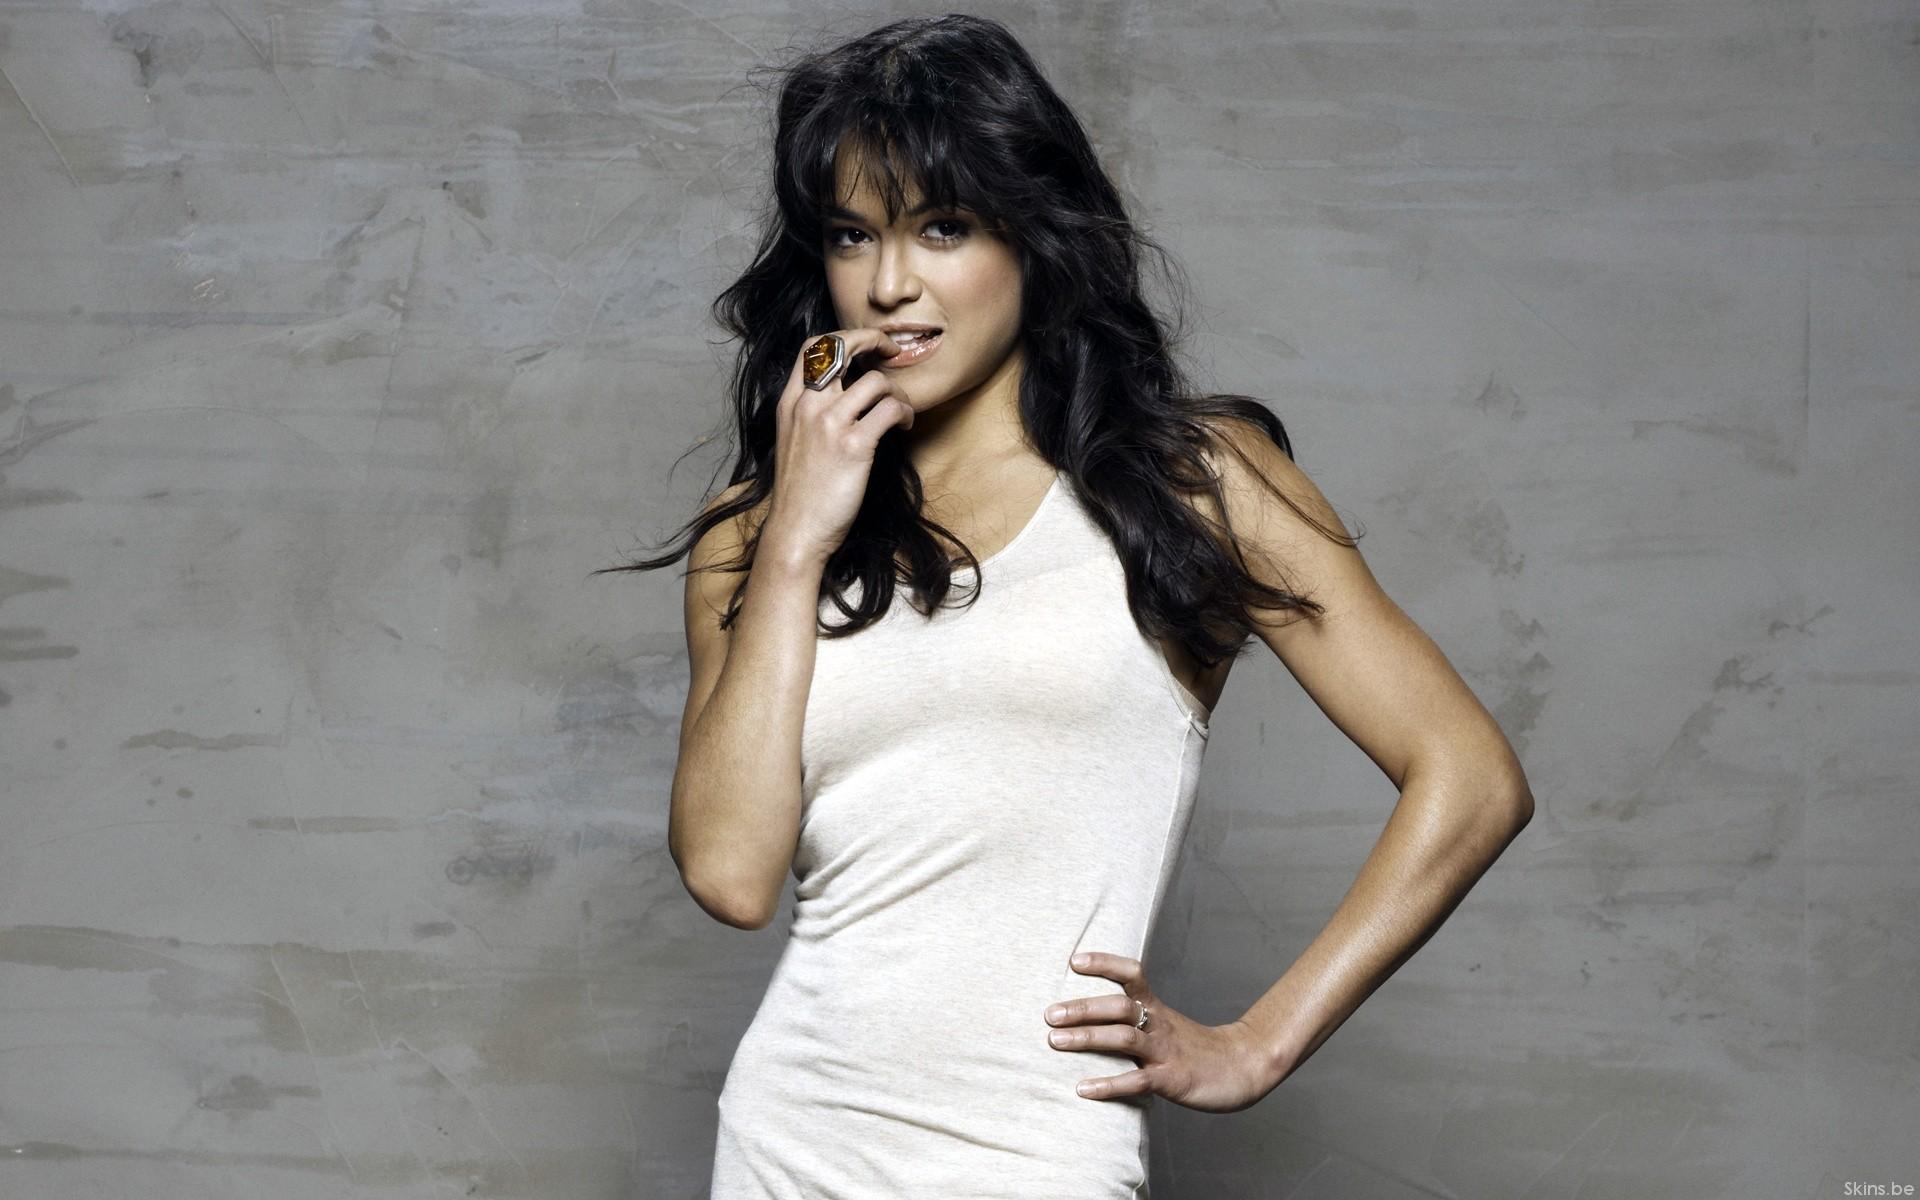 Michelle Rodriguez vestidos - 1920x1200